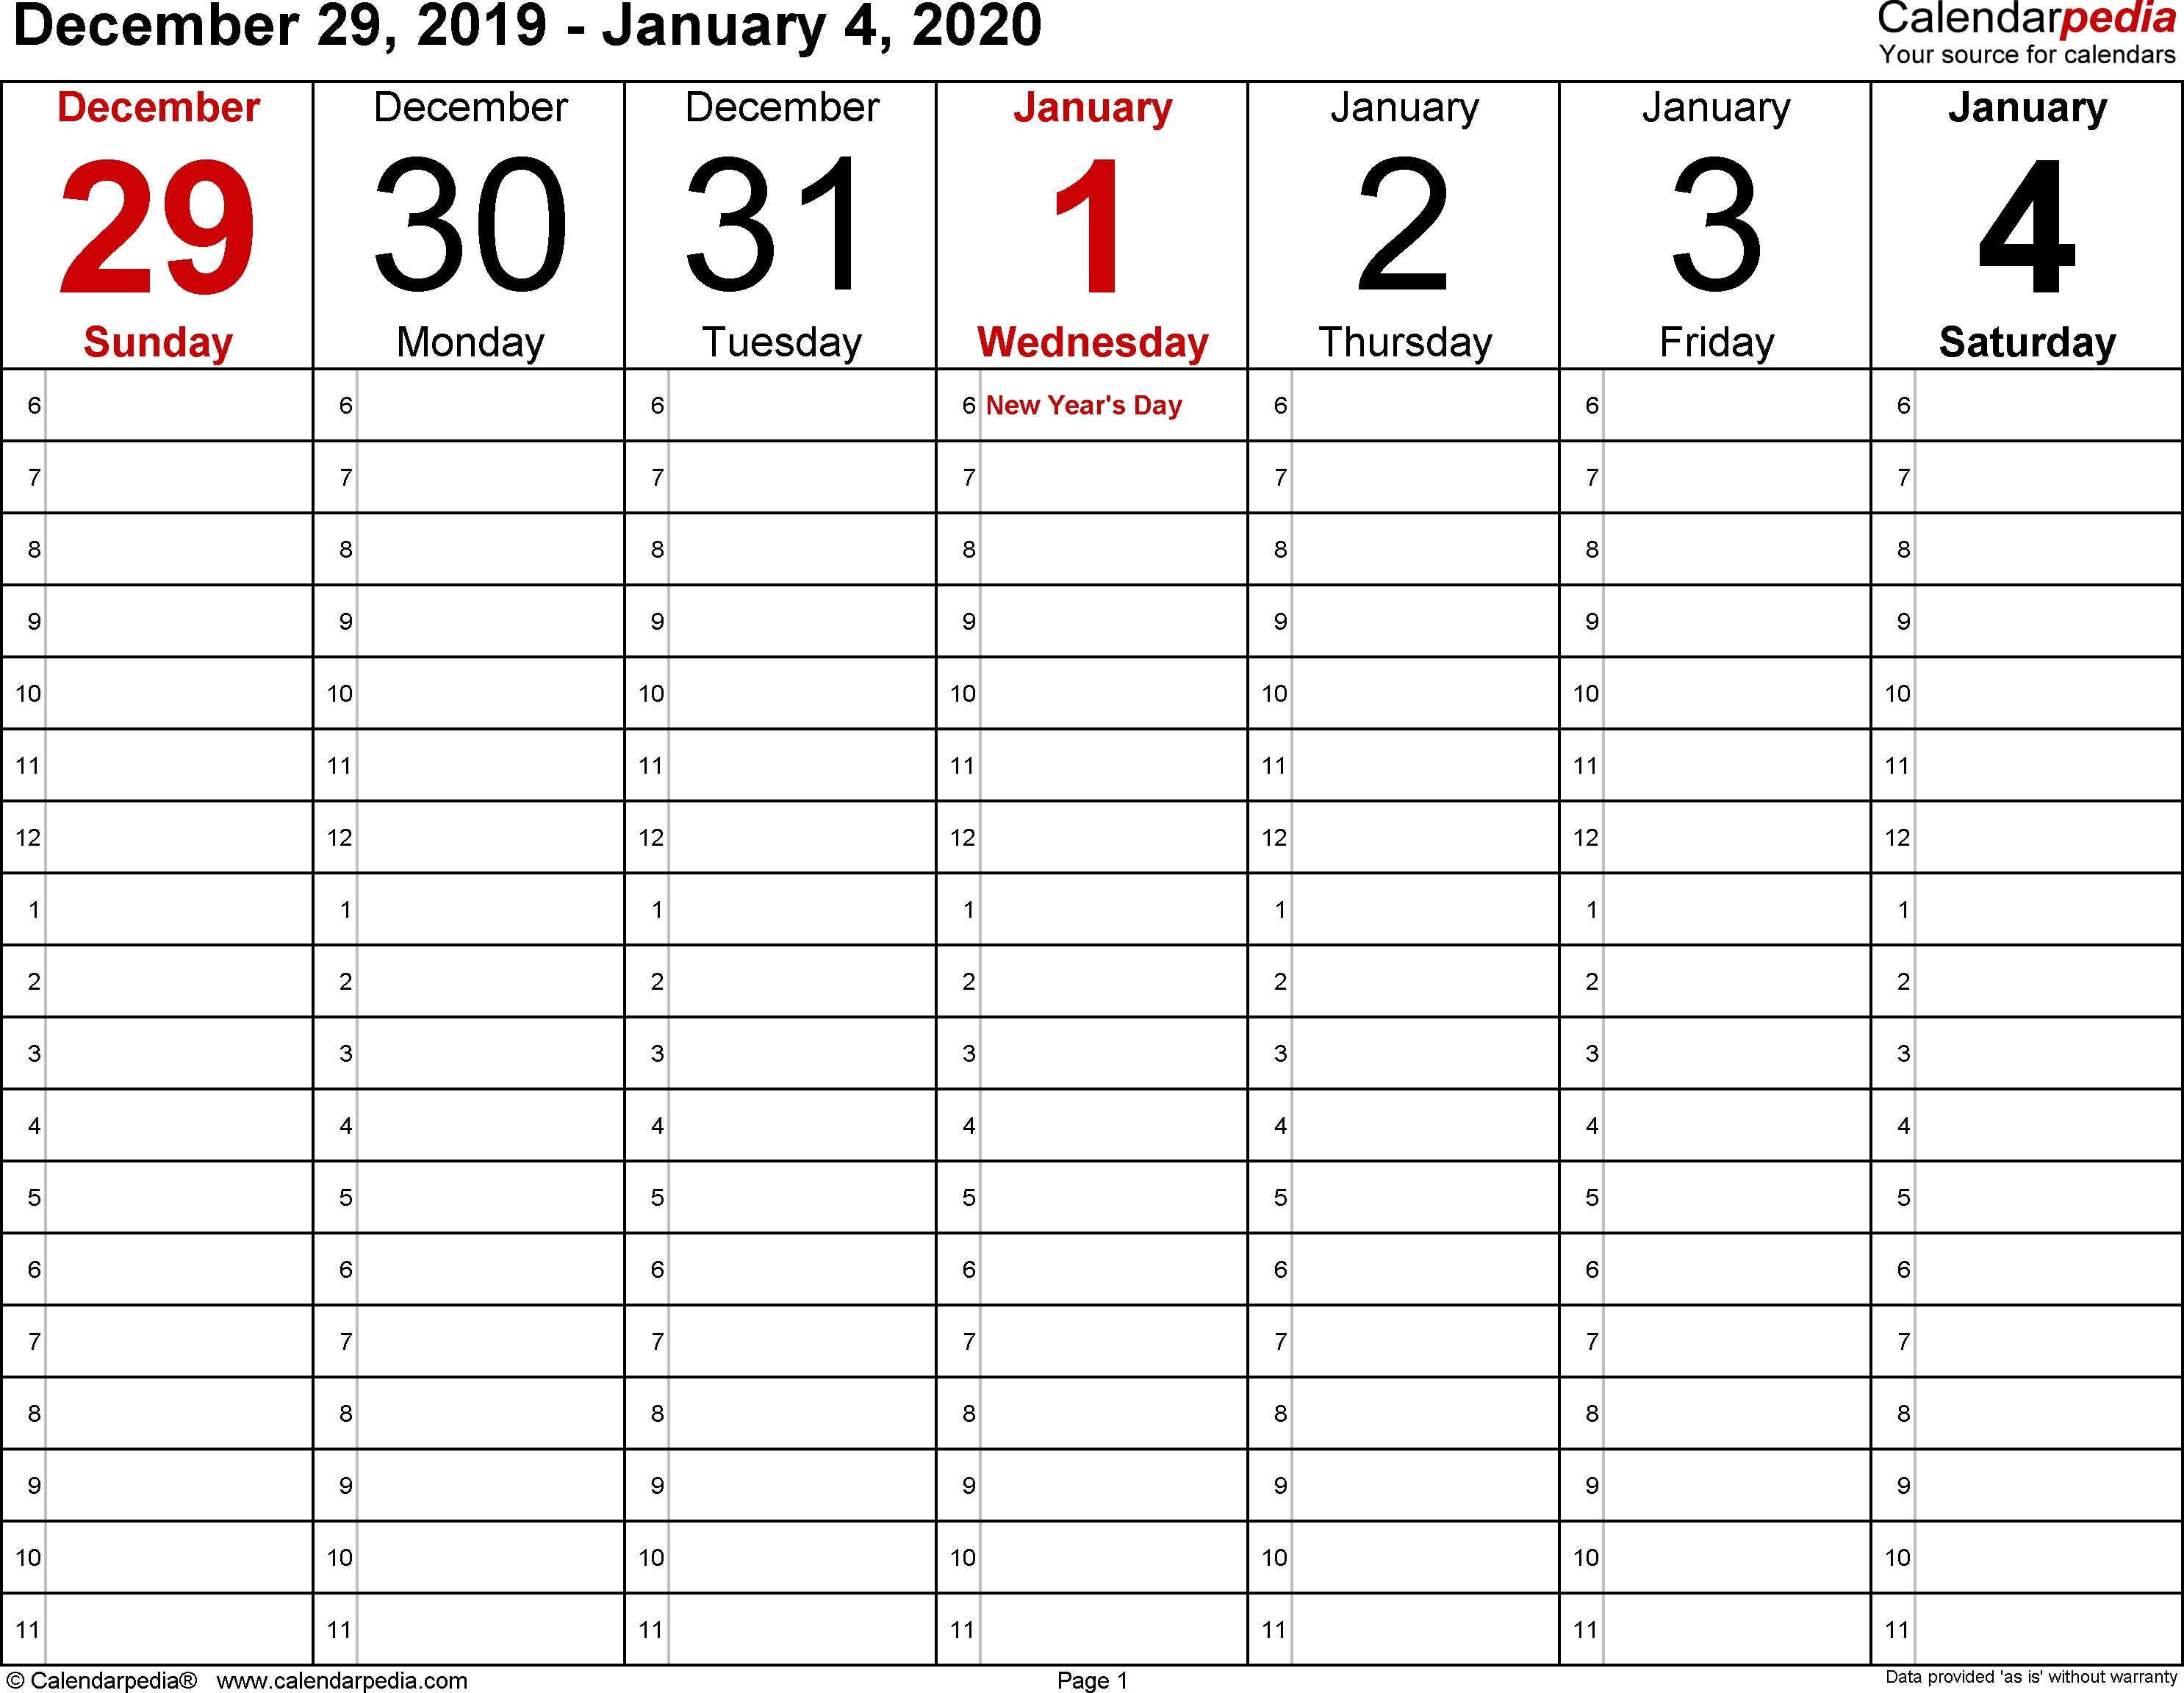 Calendarpedia - Your Source For Calendars Calendarpedia 2020 Printable South Africa